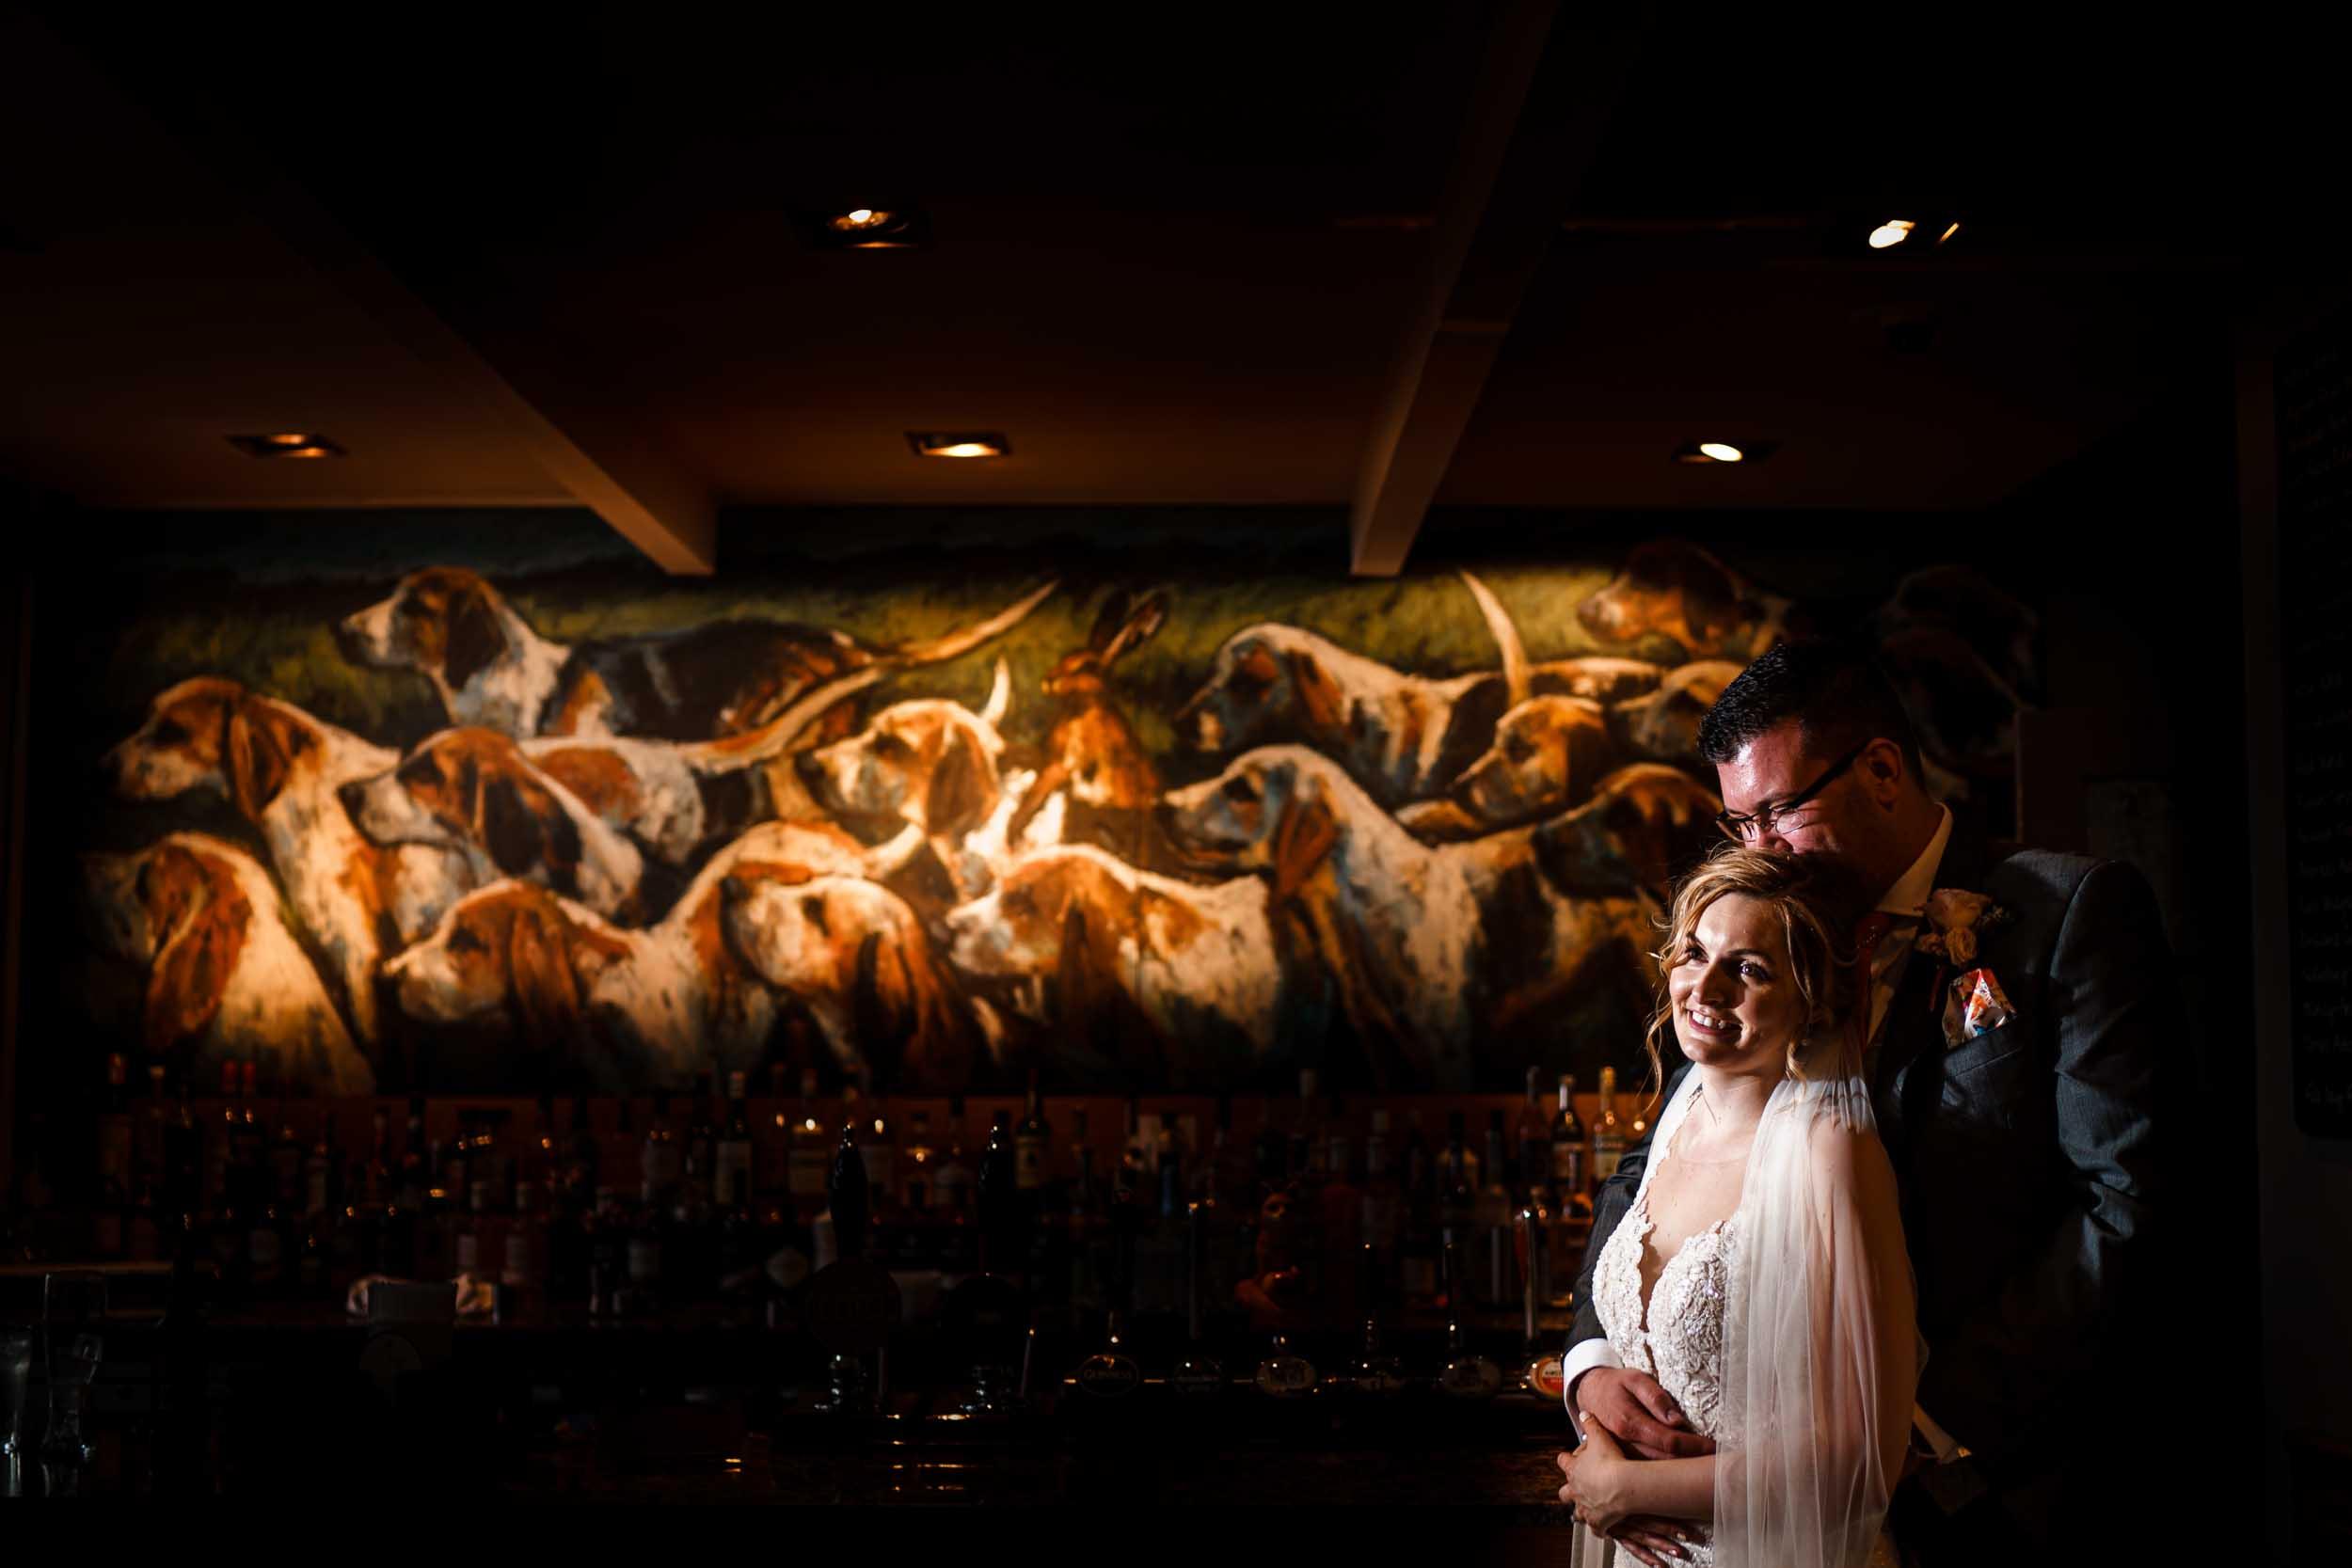 Cotswolds Wedding Photographer - David Liebst